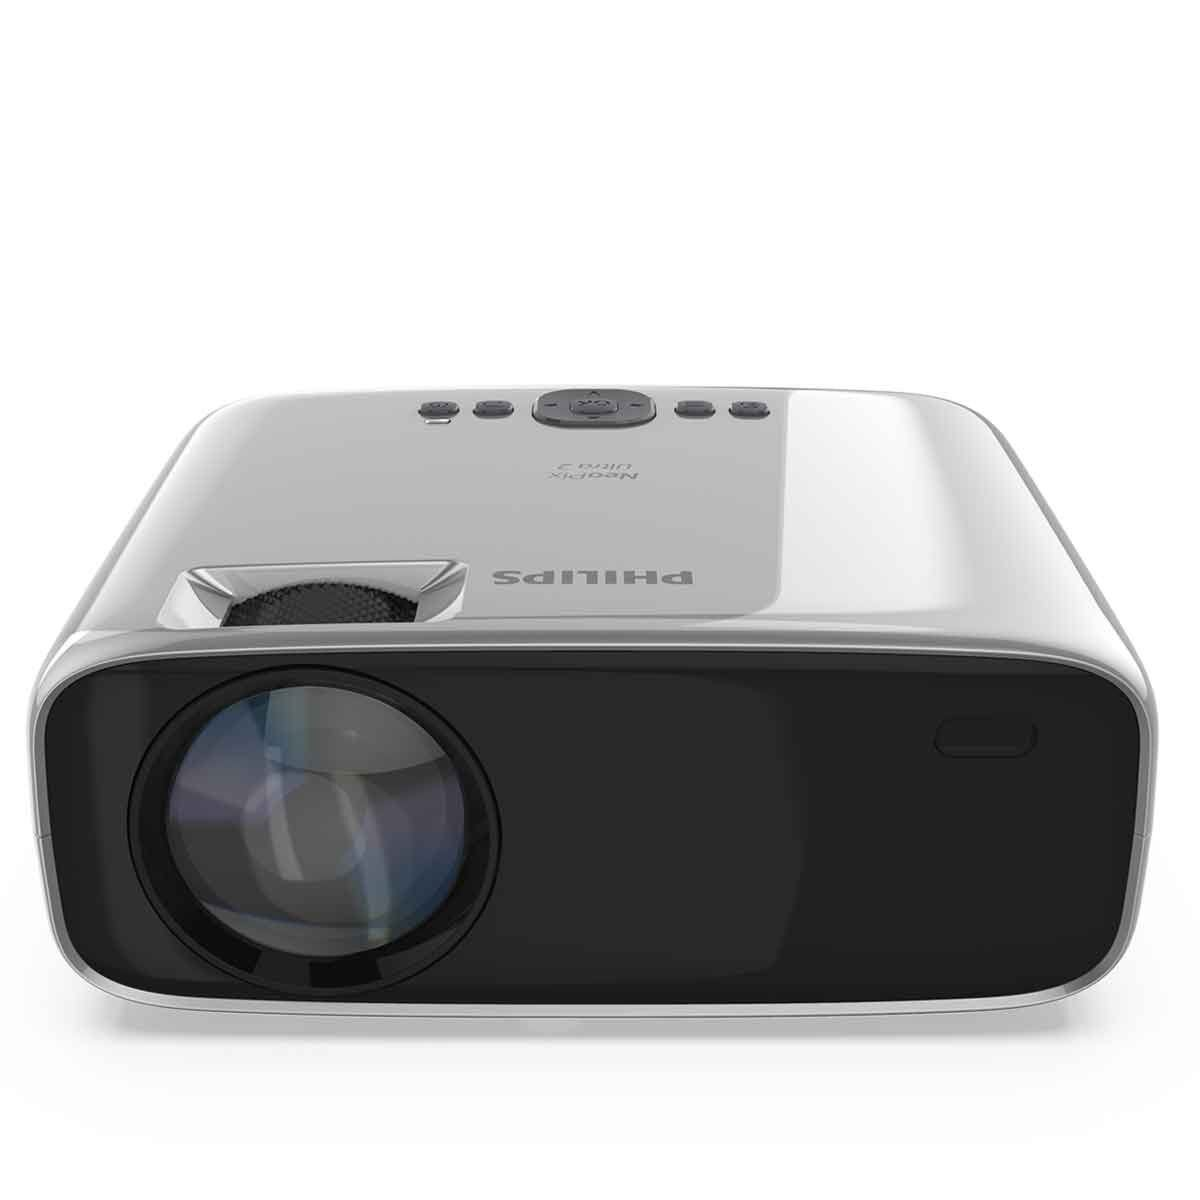 Philips NeoPix Ultra 2 NPX642 Full HD Smart Home Cinema Projector